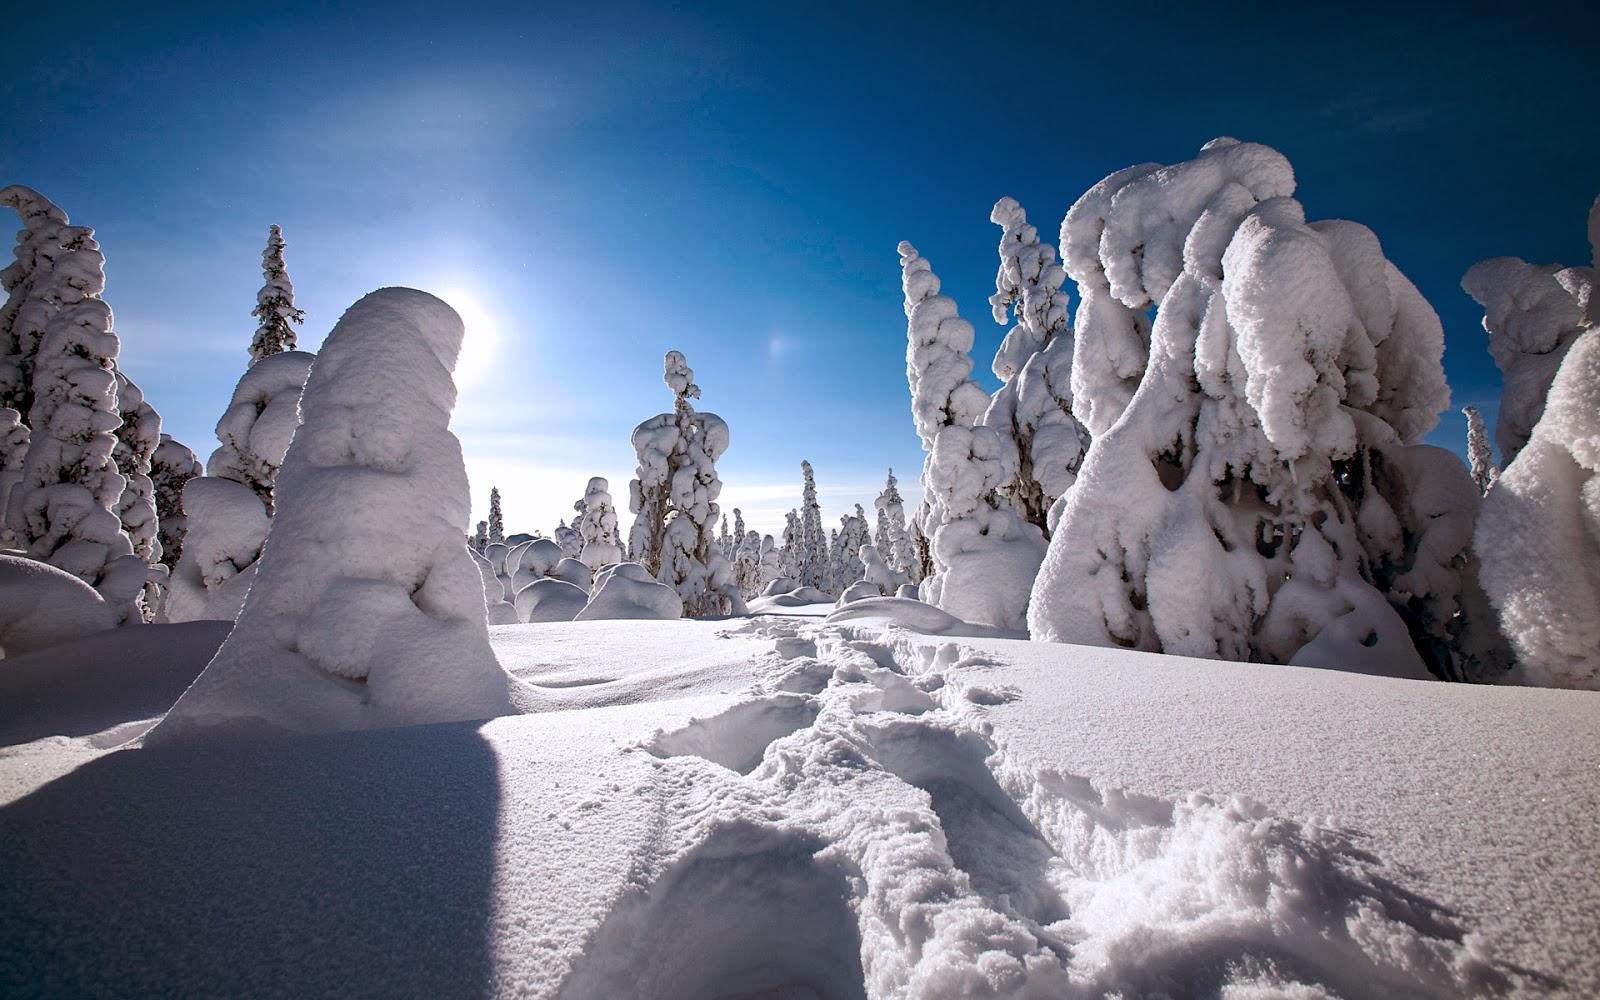 "<img src=""http://4.bp.blogspot.com/-KSxBRfTpnIA/Ut5GKpxrS4I/AAAAAAAAJik/zm21BNUWONE/s1600/winter-in-finland.jpg"" alt=""winter in finland"" />"